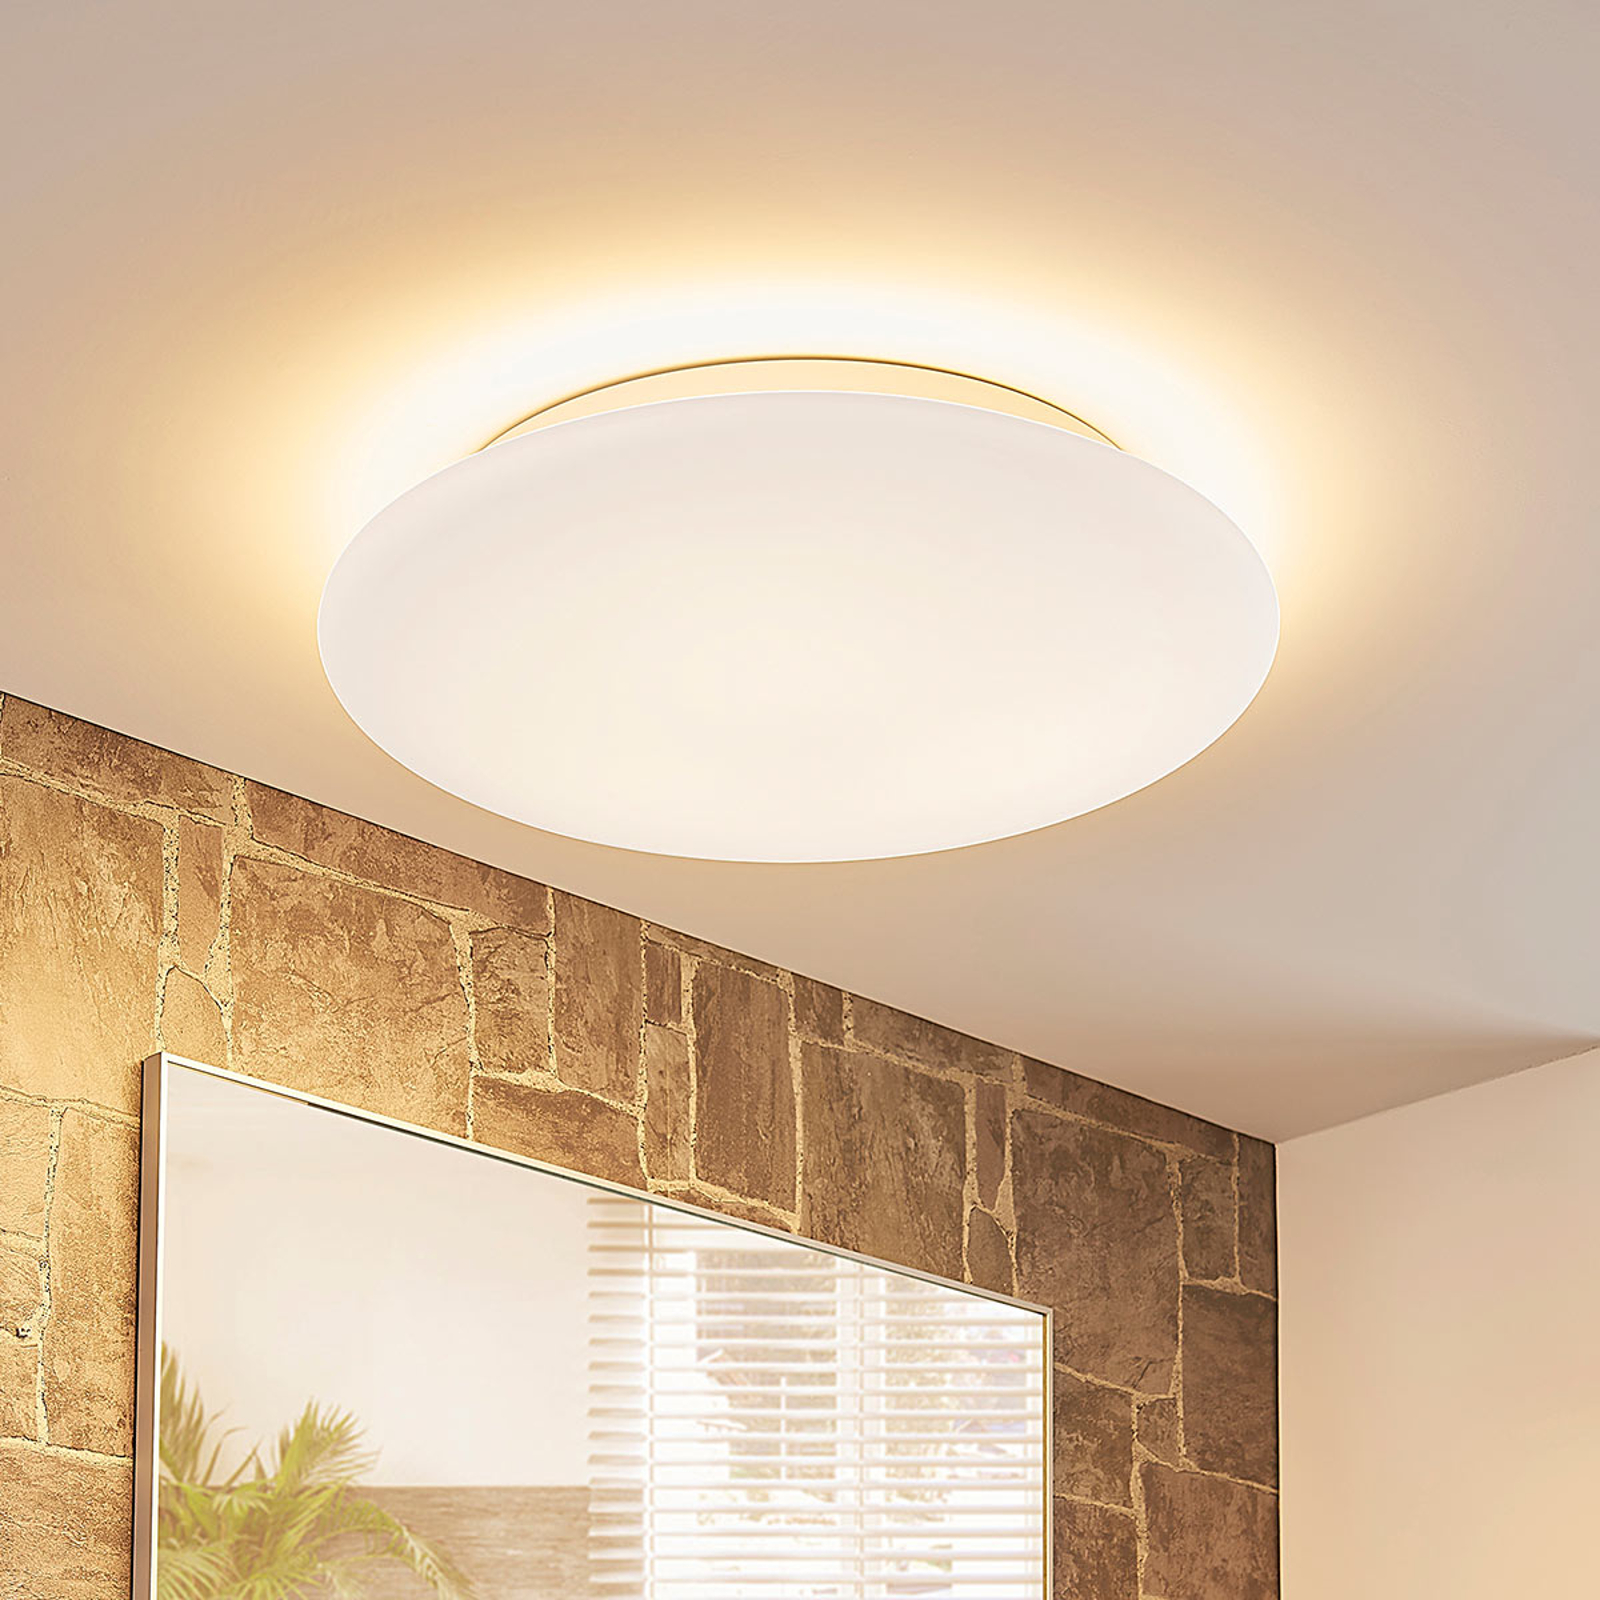 Dreistufig dimmbare LED-Deckenleuchte Toan, IP44